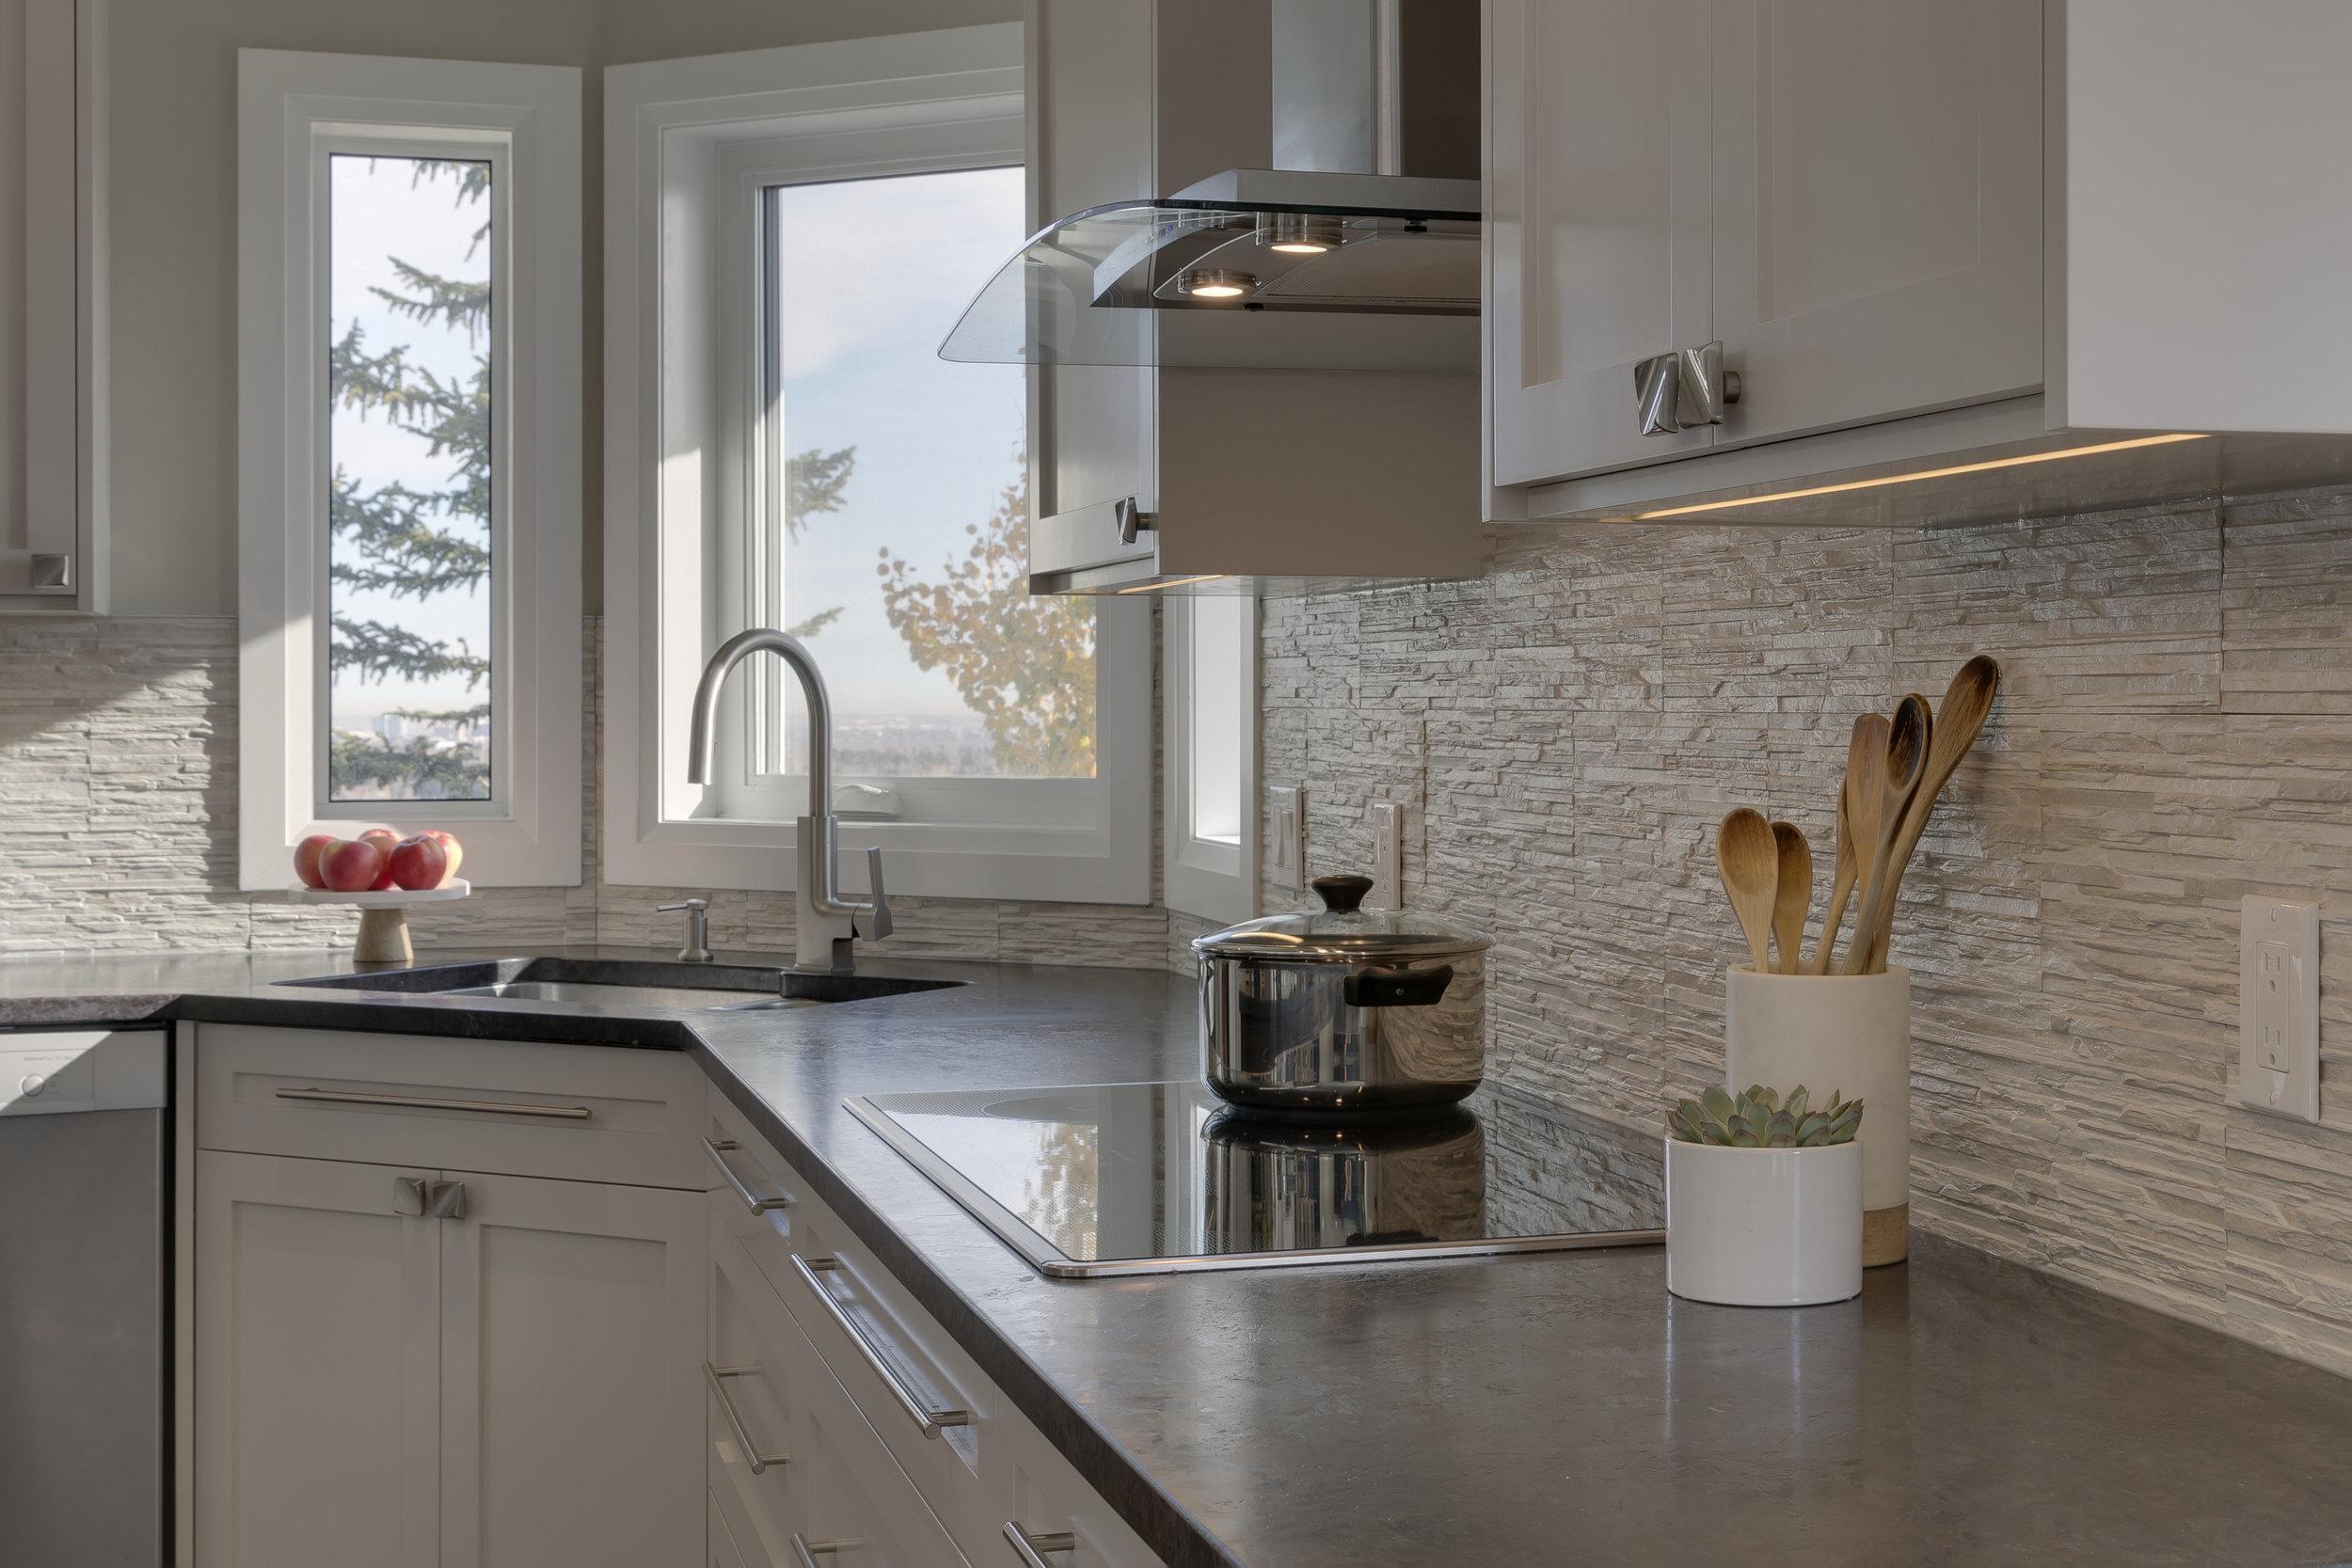 Calgary Modern Interior Design Kitchen 3.jpg